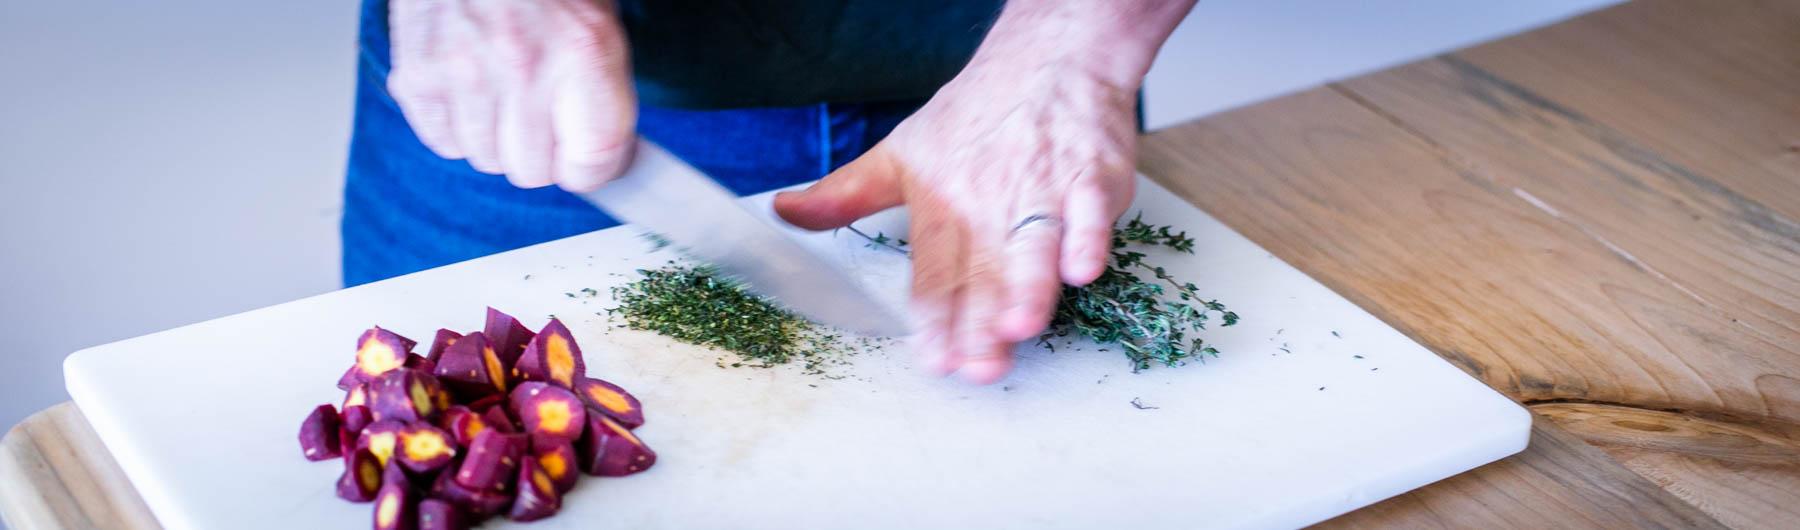 Cooking 101: Vegetables